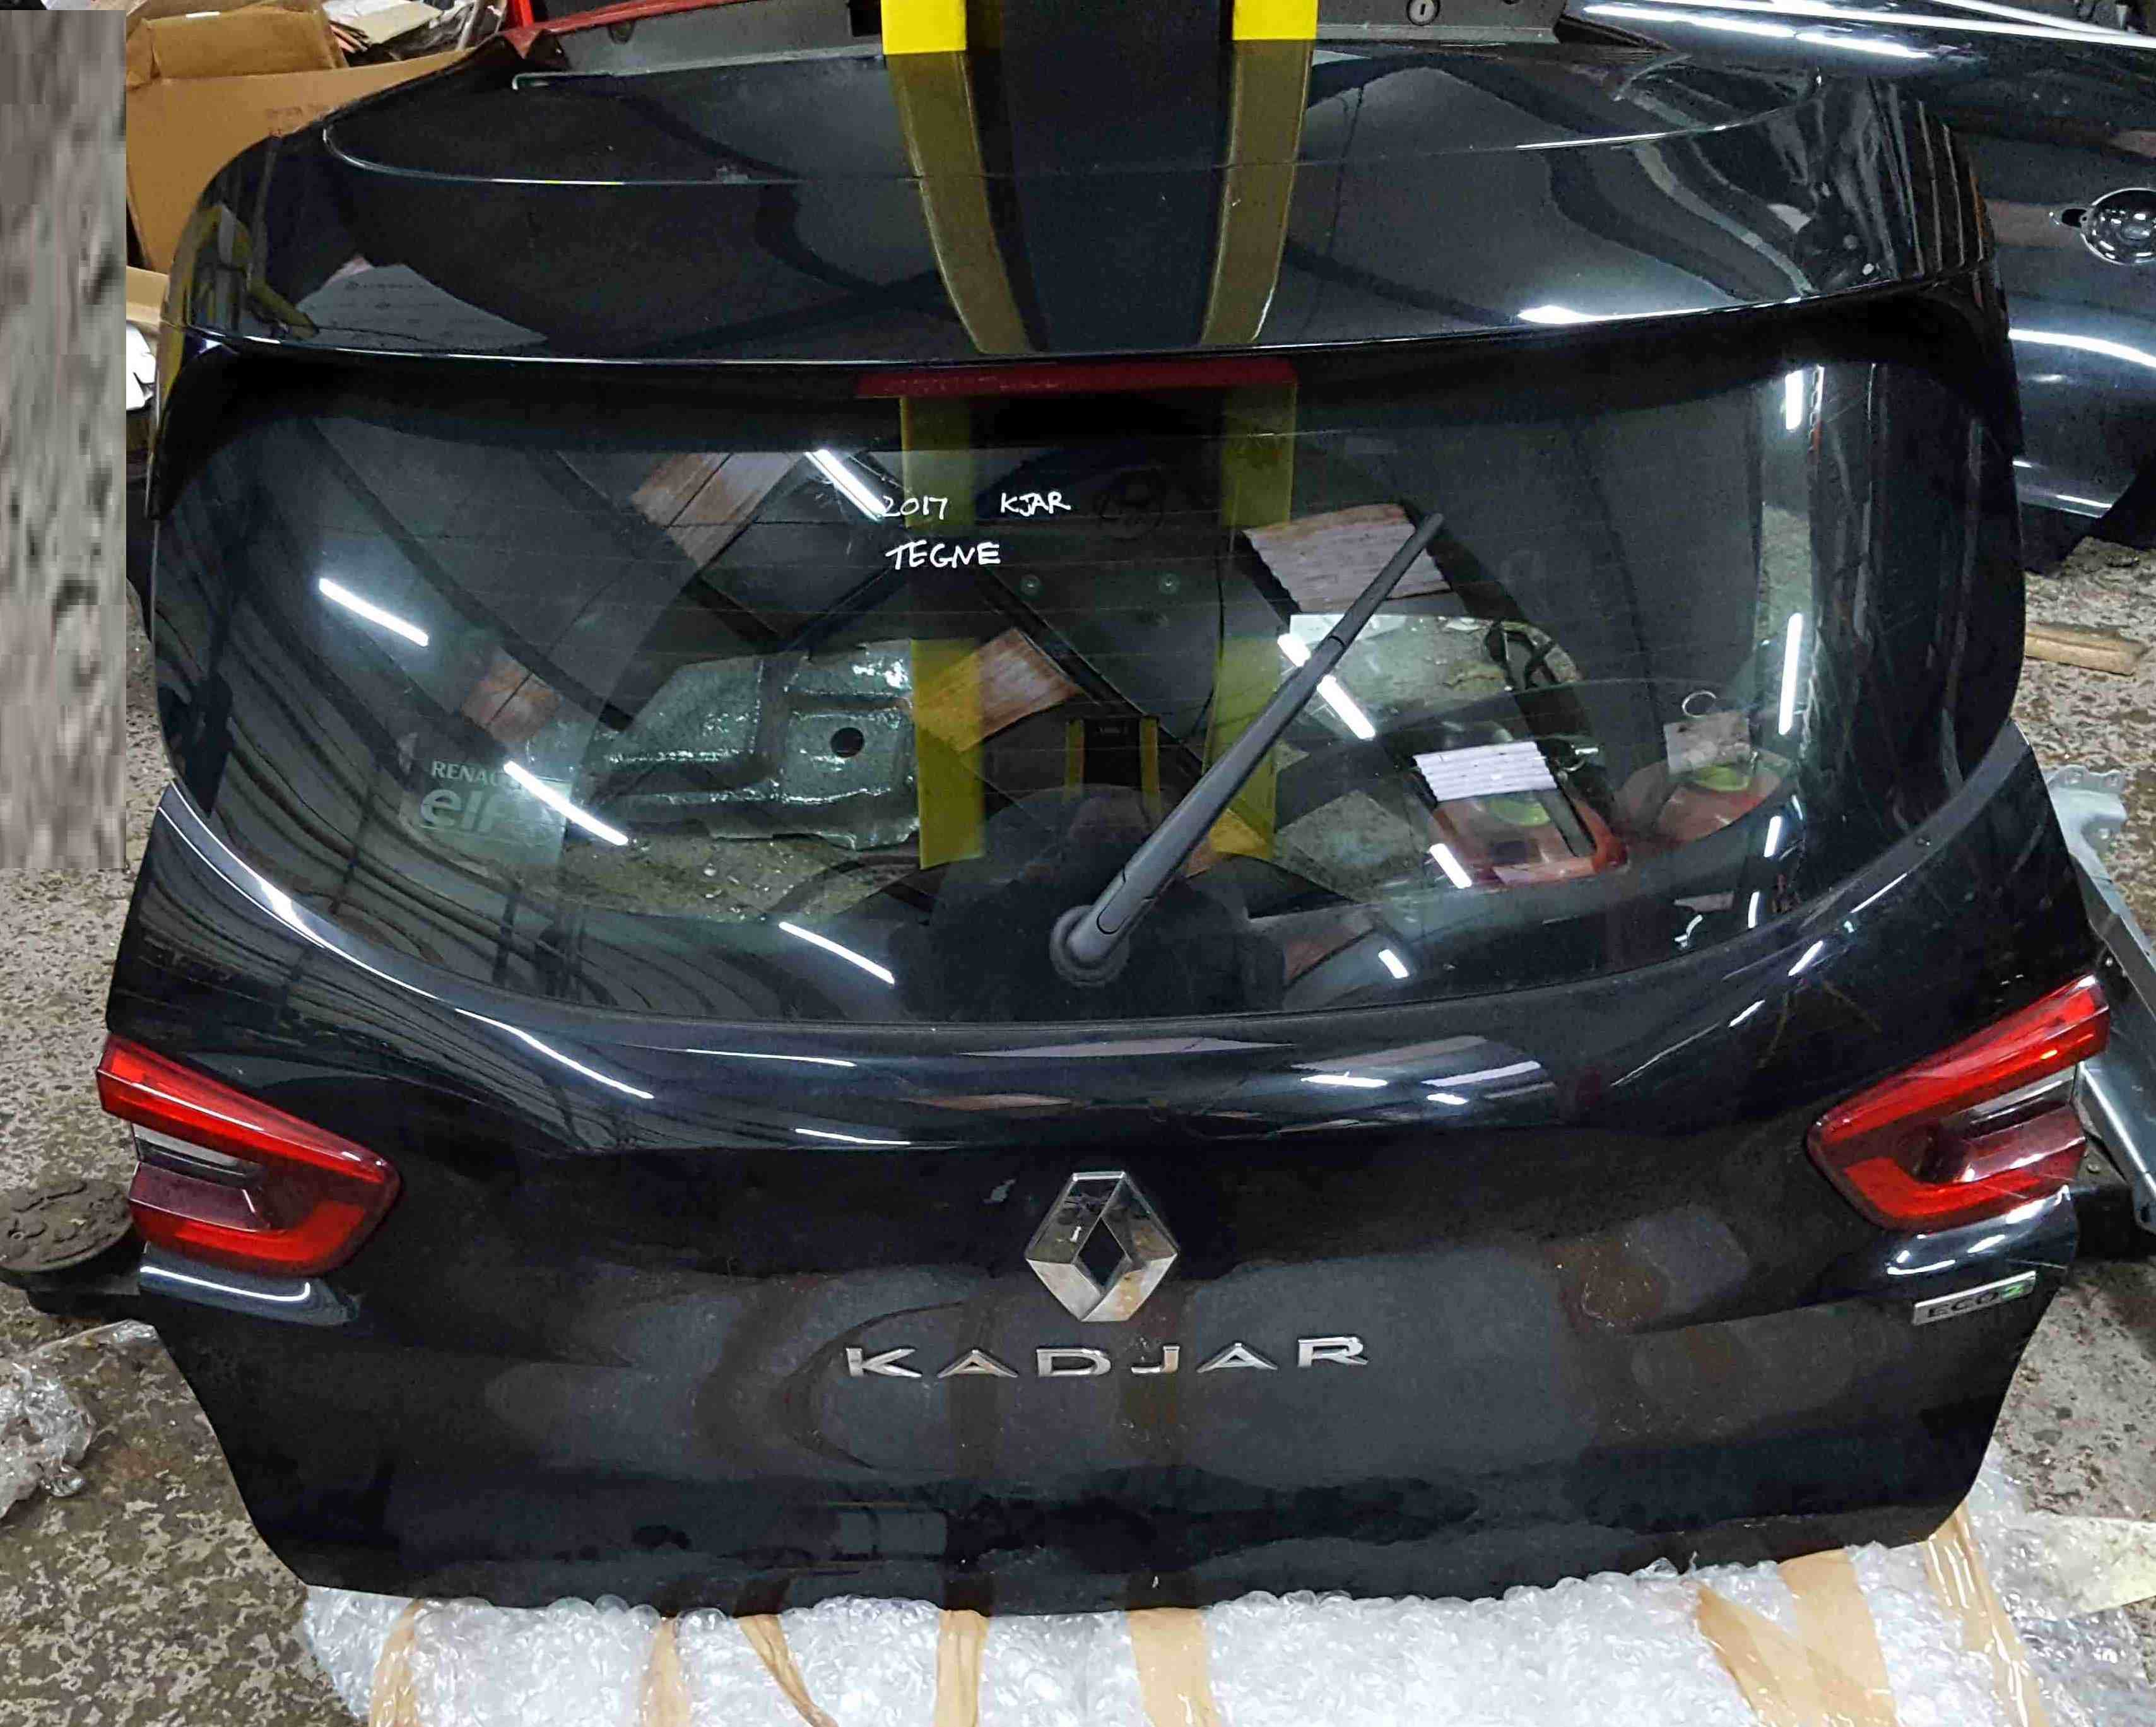 Renault Kadjar 2015-2021 Rear Tailgate Boot Black TEGNE